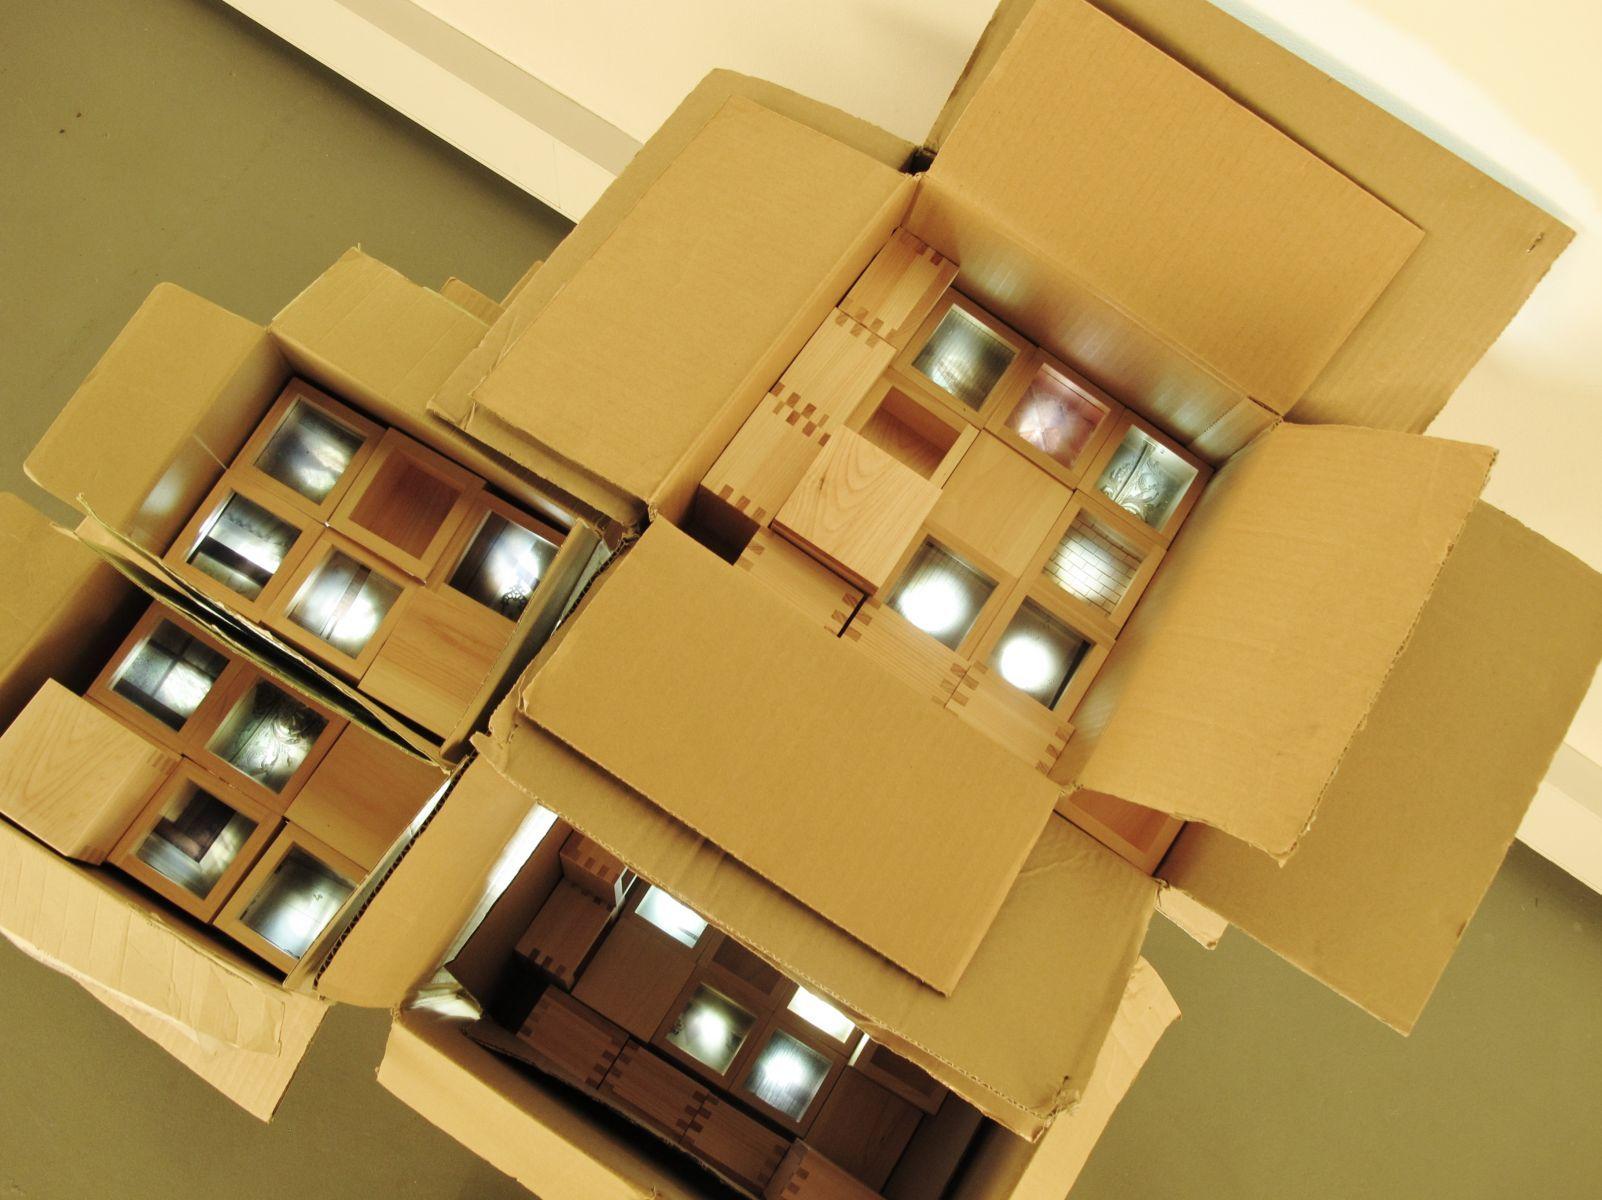 LifeboxJapanese Cypress masu boxes, cardboard, lightbox. Variable dimensions.